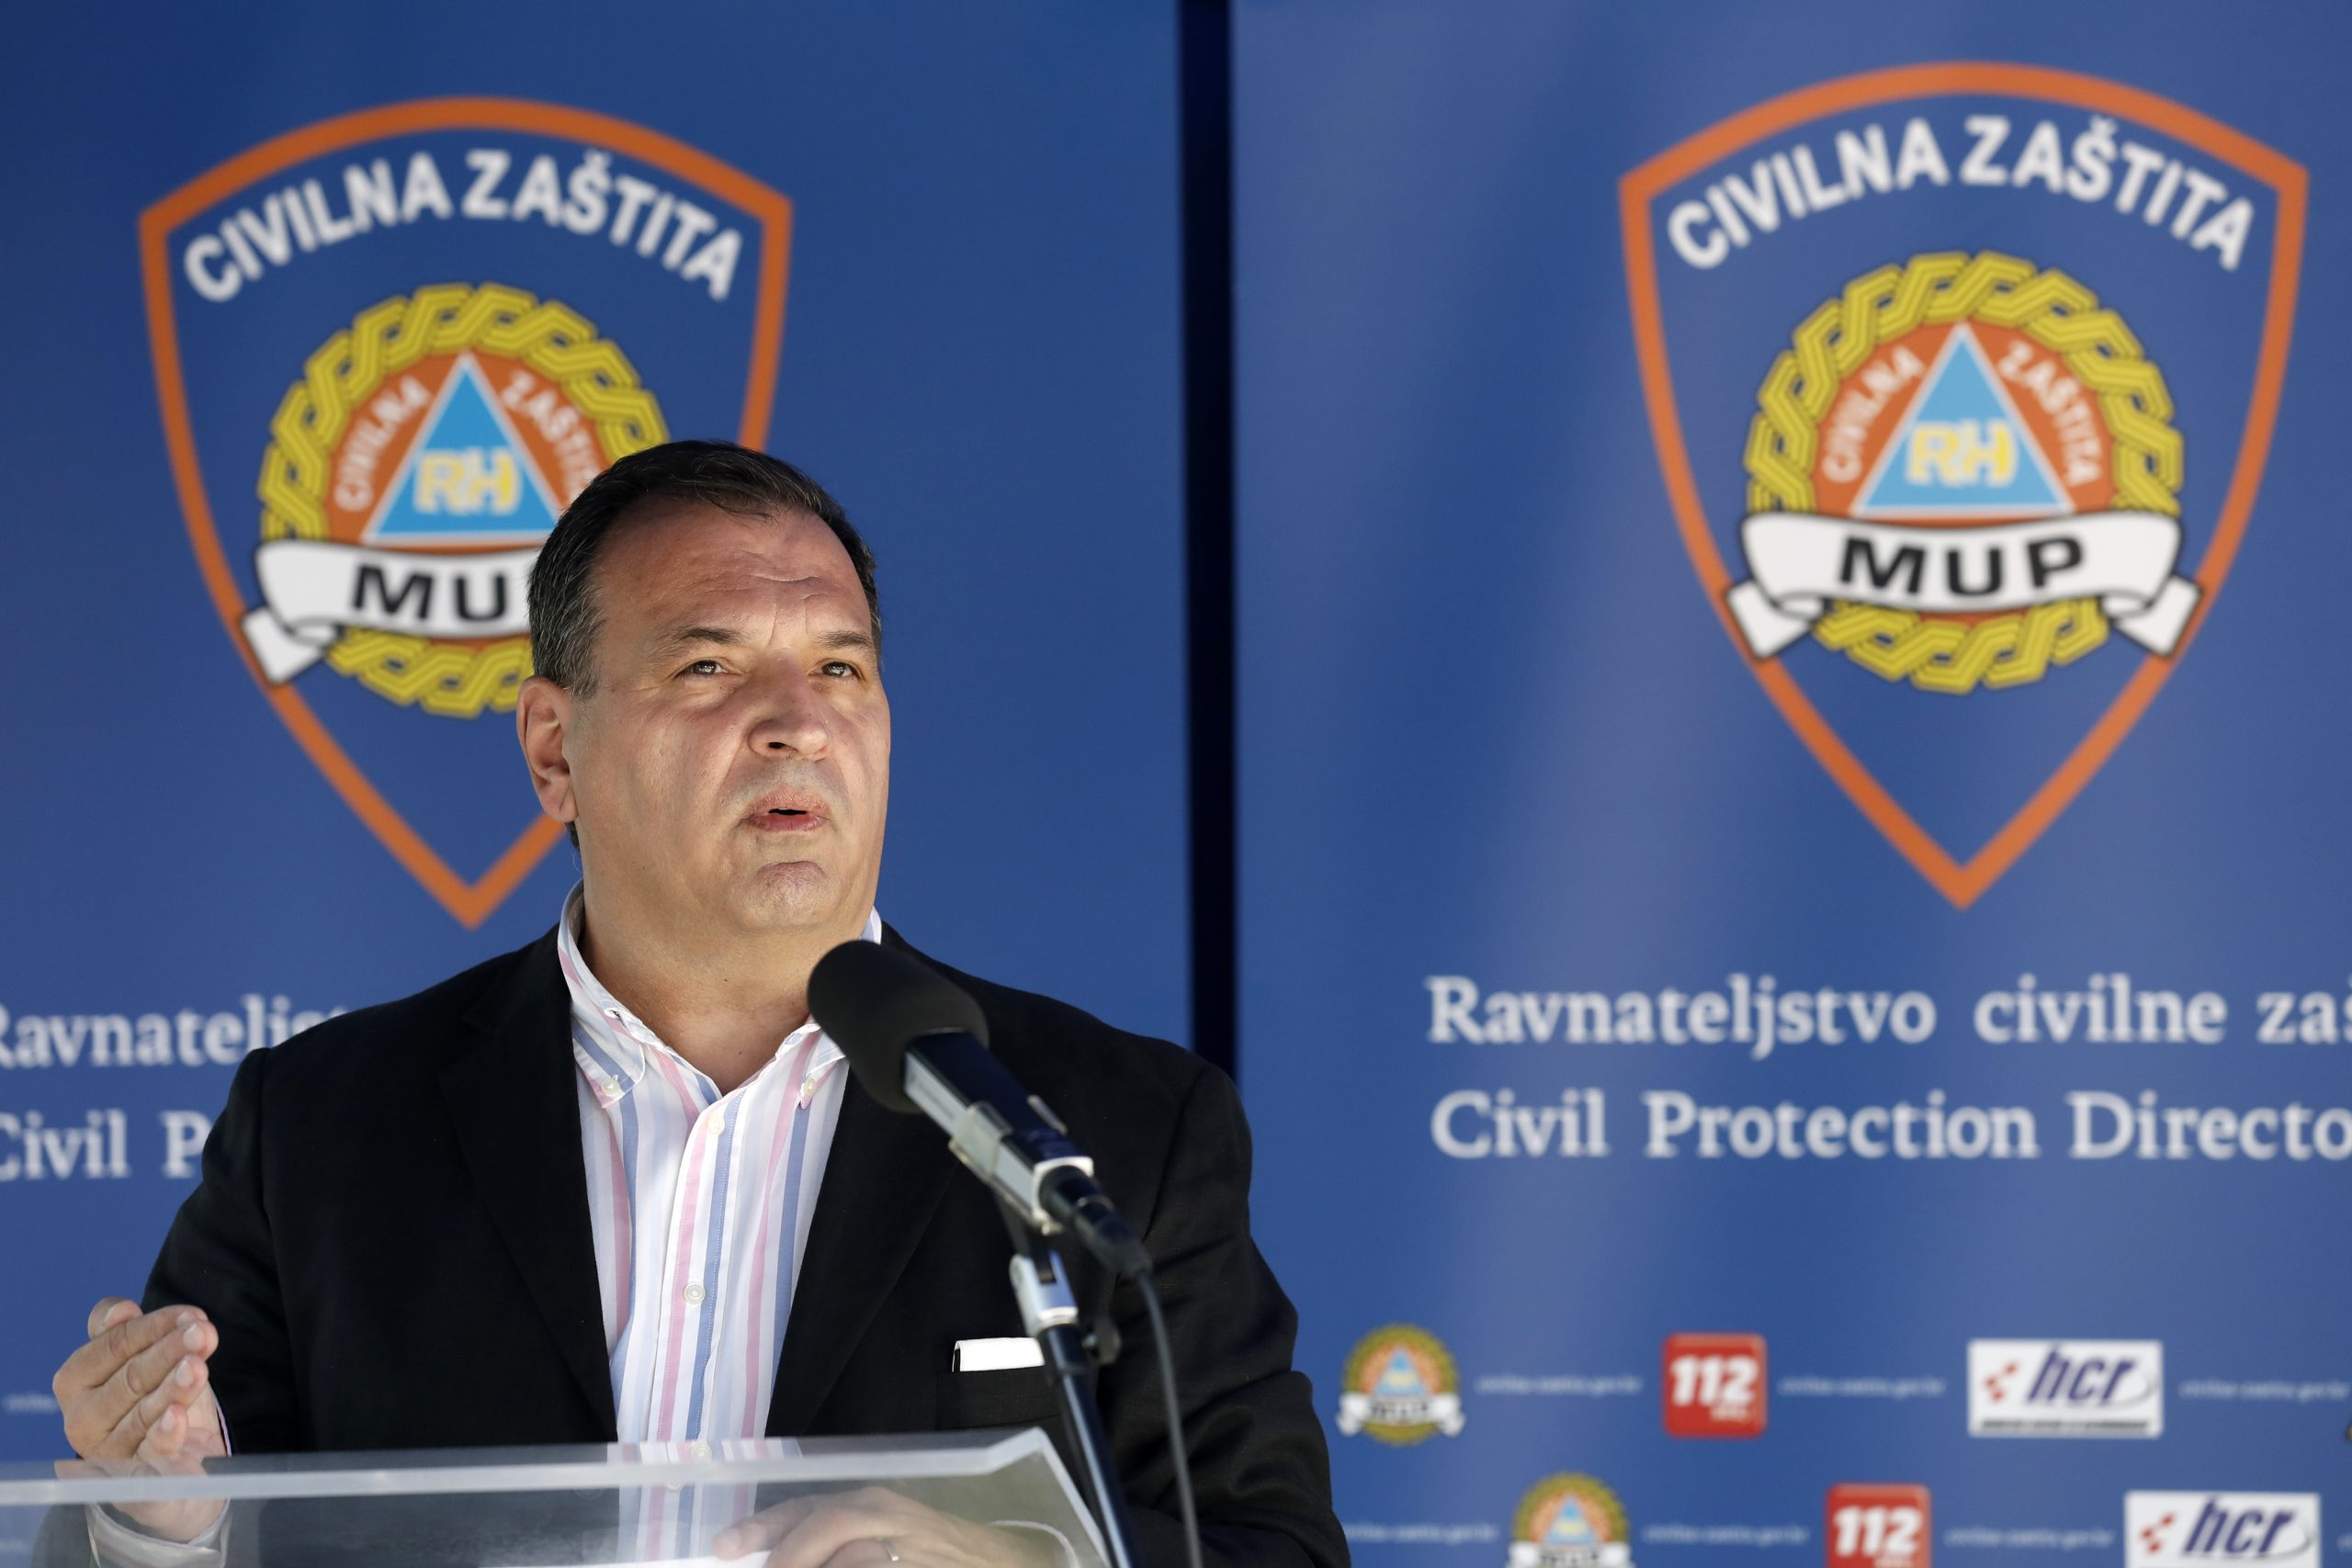 Vili Beroš / Foto : Tomislav Kristo/CROPIX/POOL/PIXSELL